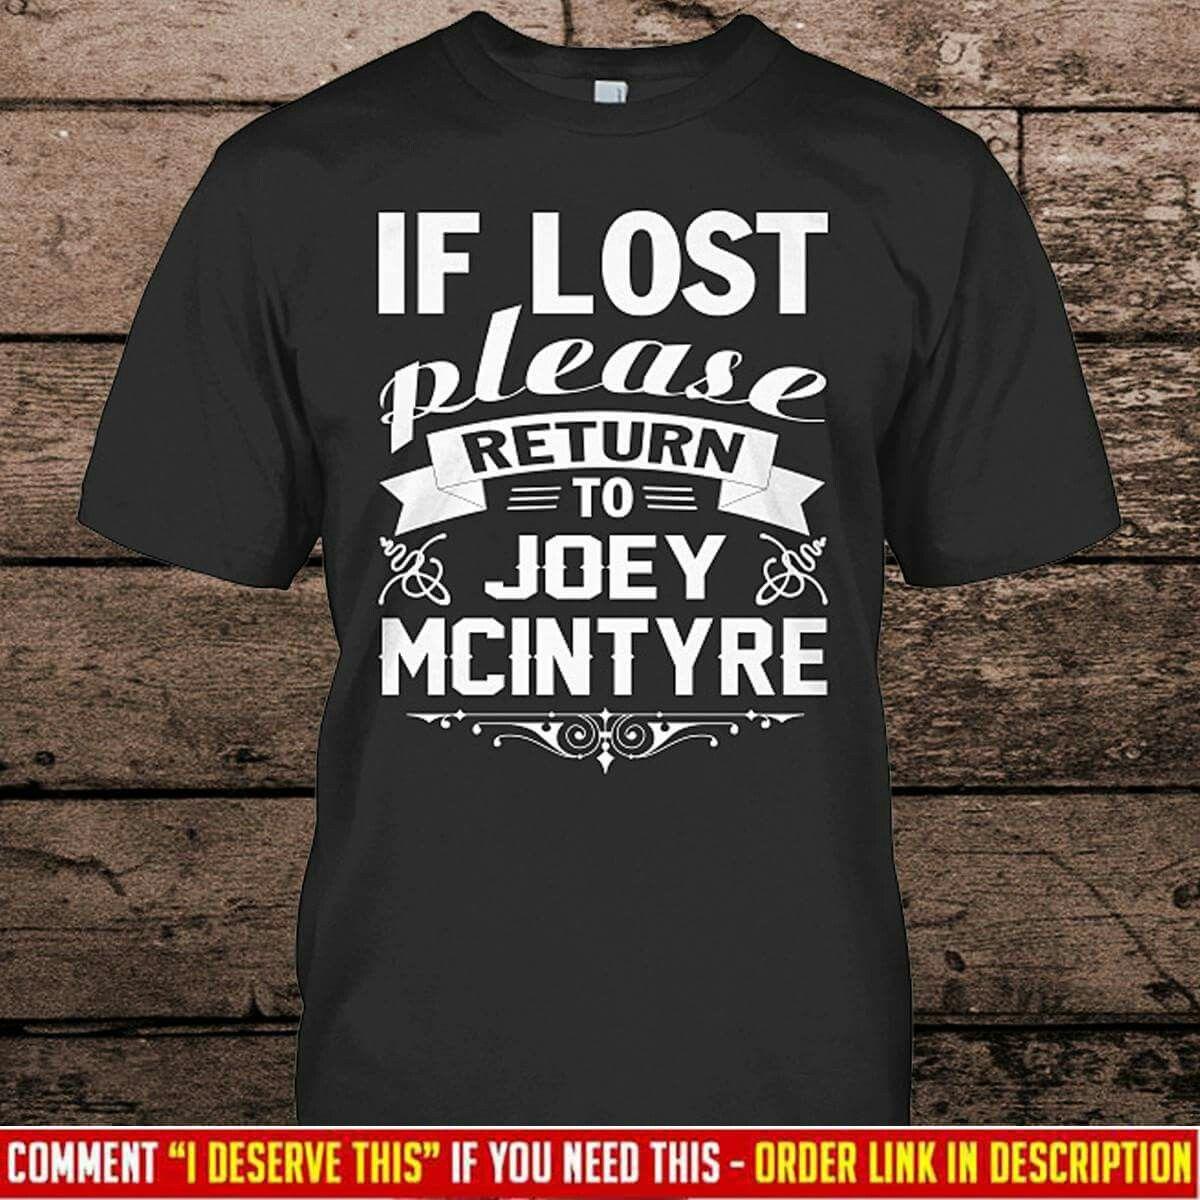 83a47ac6d28e Need this Joey McIntyre tshirt | My 1st love-NKOTB | Concert shirts ...